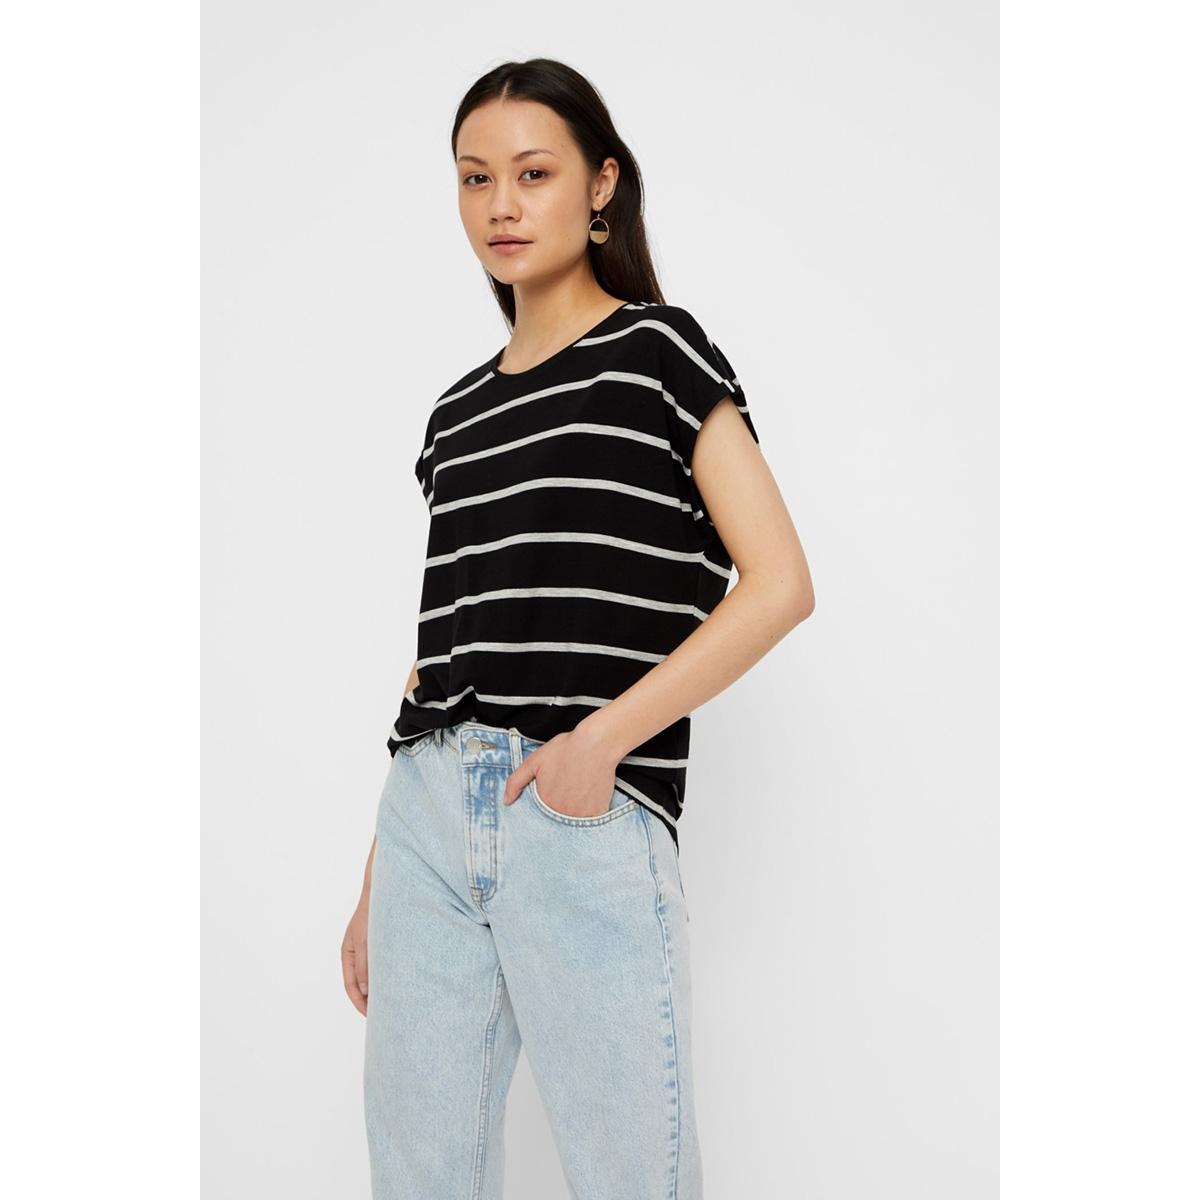 vmava plain ss top nemo stripe ga n 10220773 vero moda t-shirt black/lgm